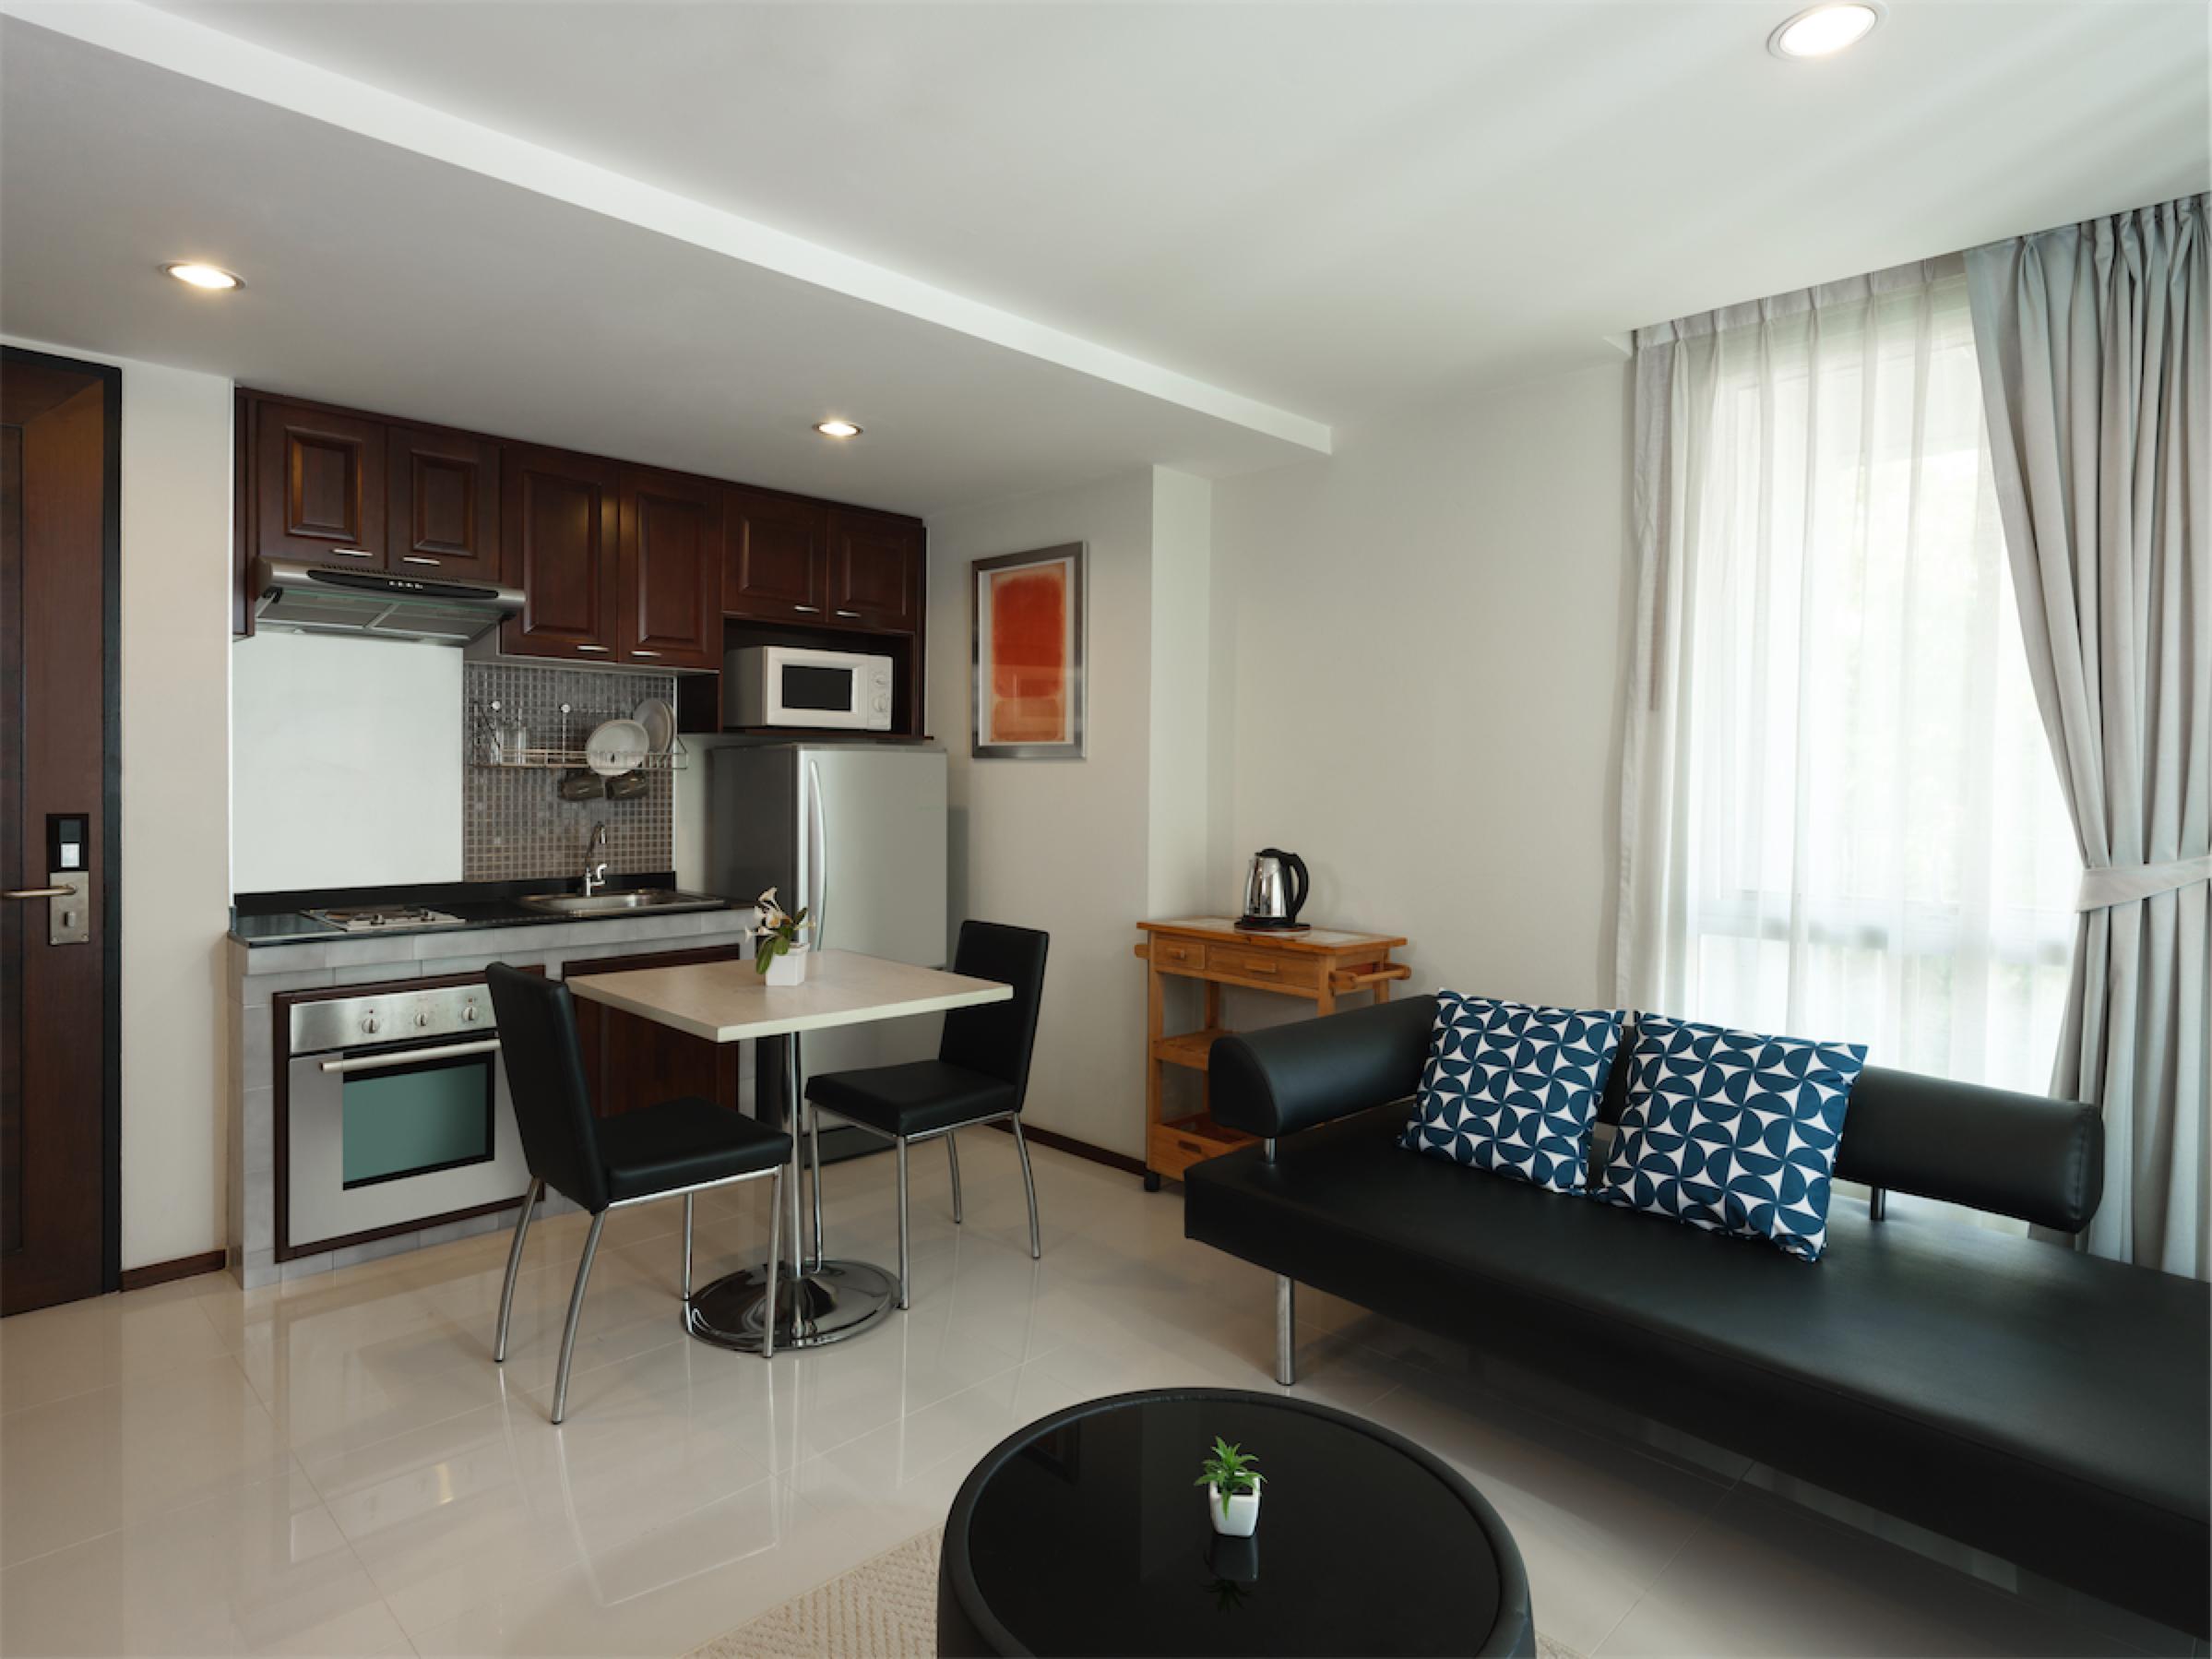 Room 601-012.jpg